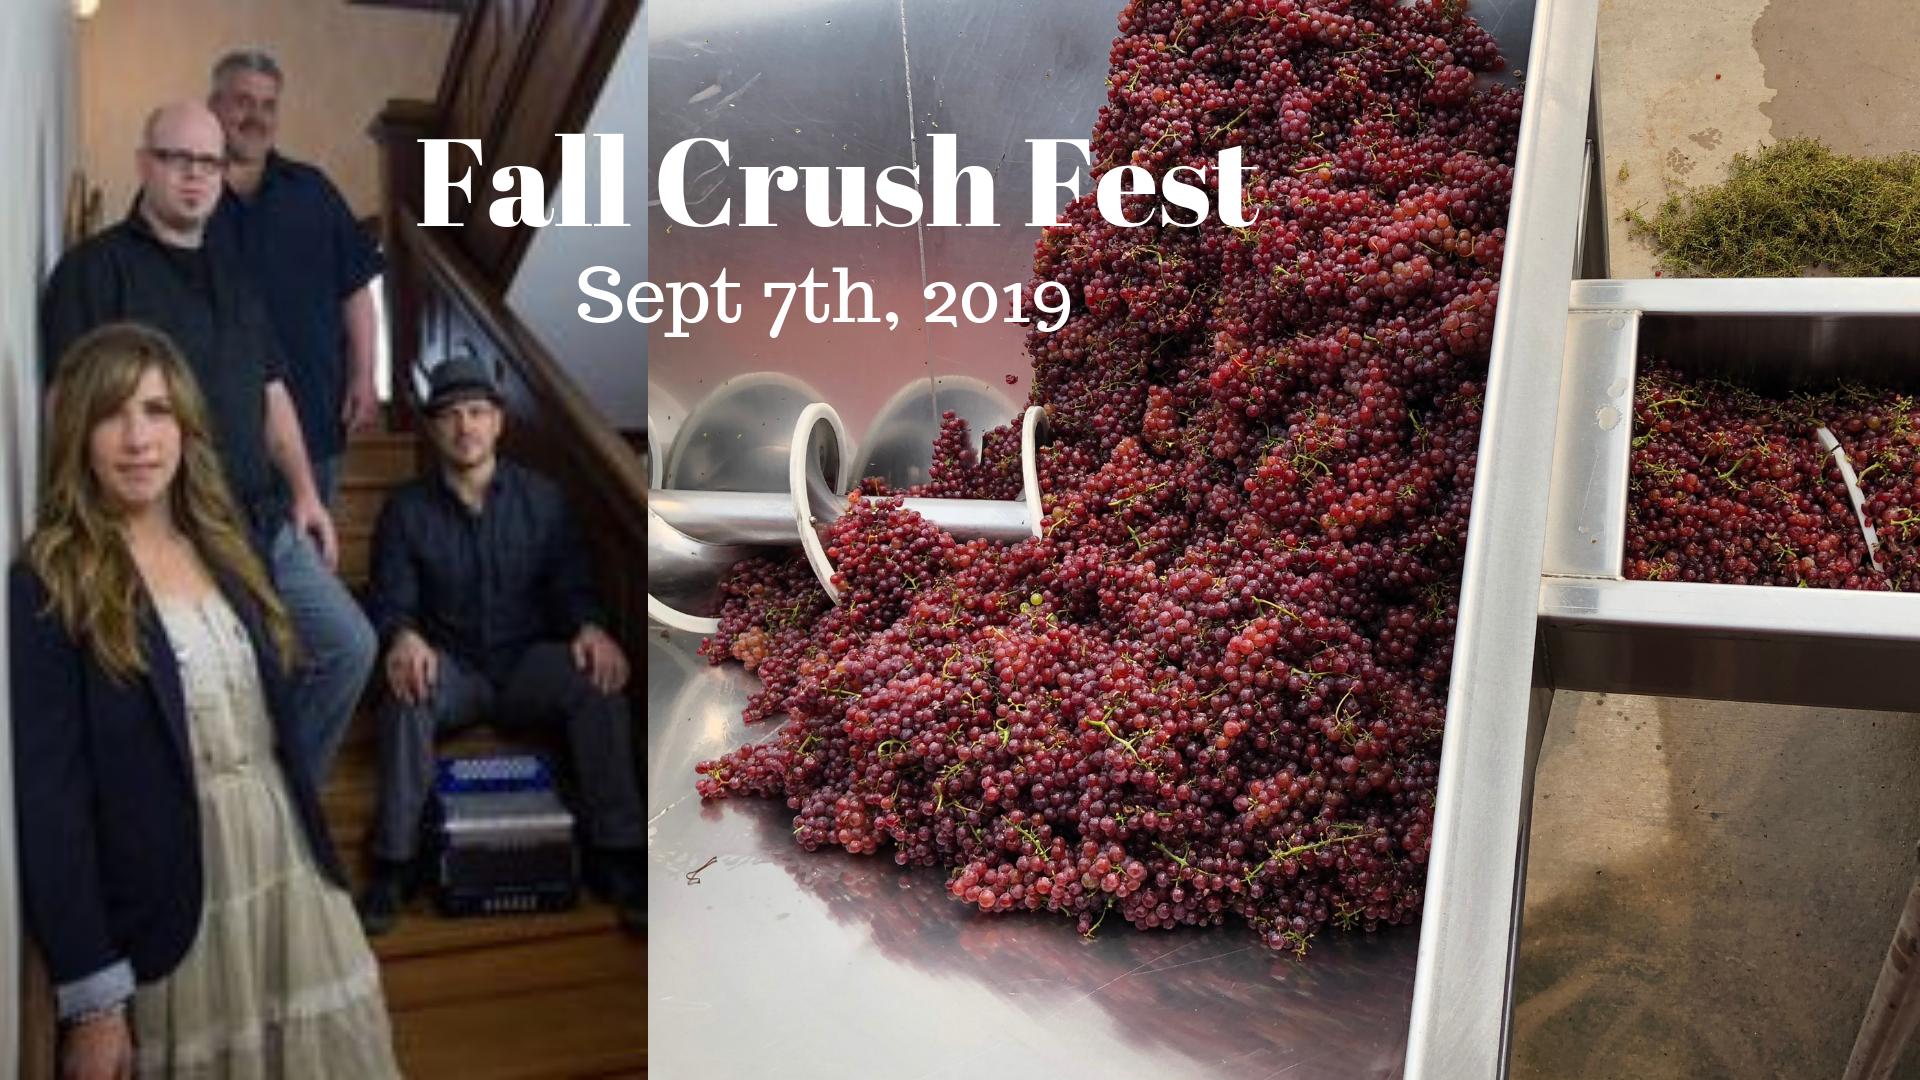 Fall Crush Fest Sept 7th, 2019.png